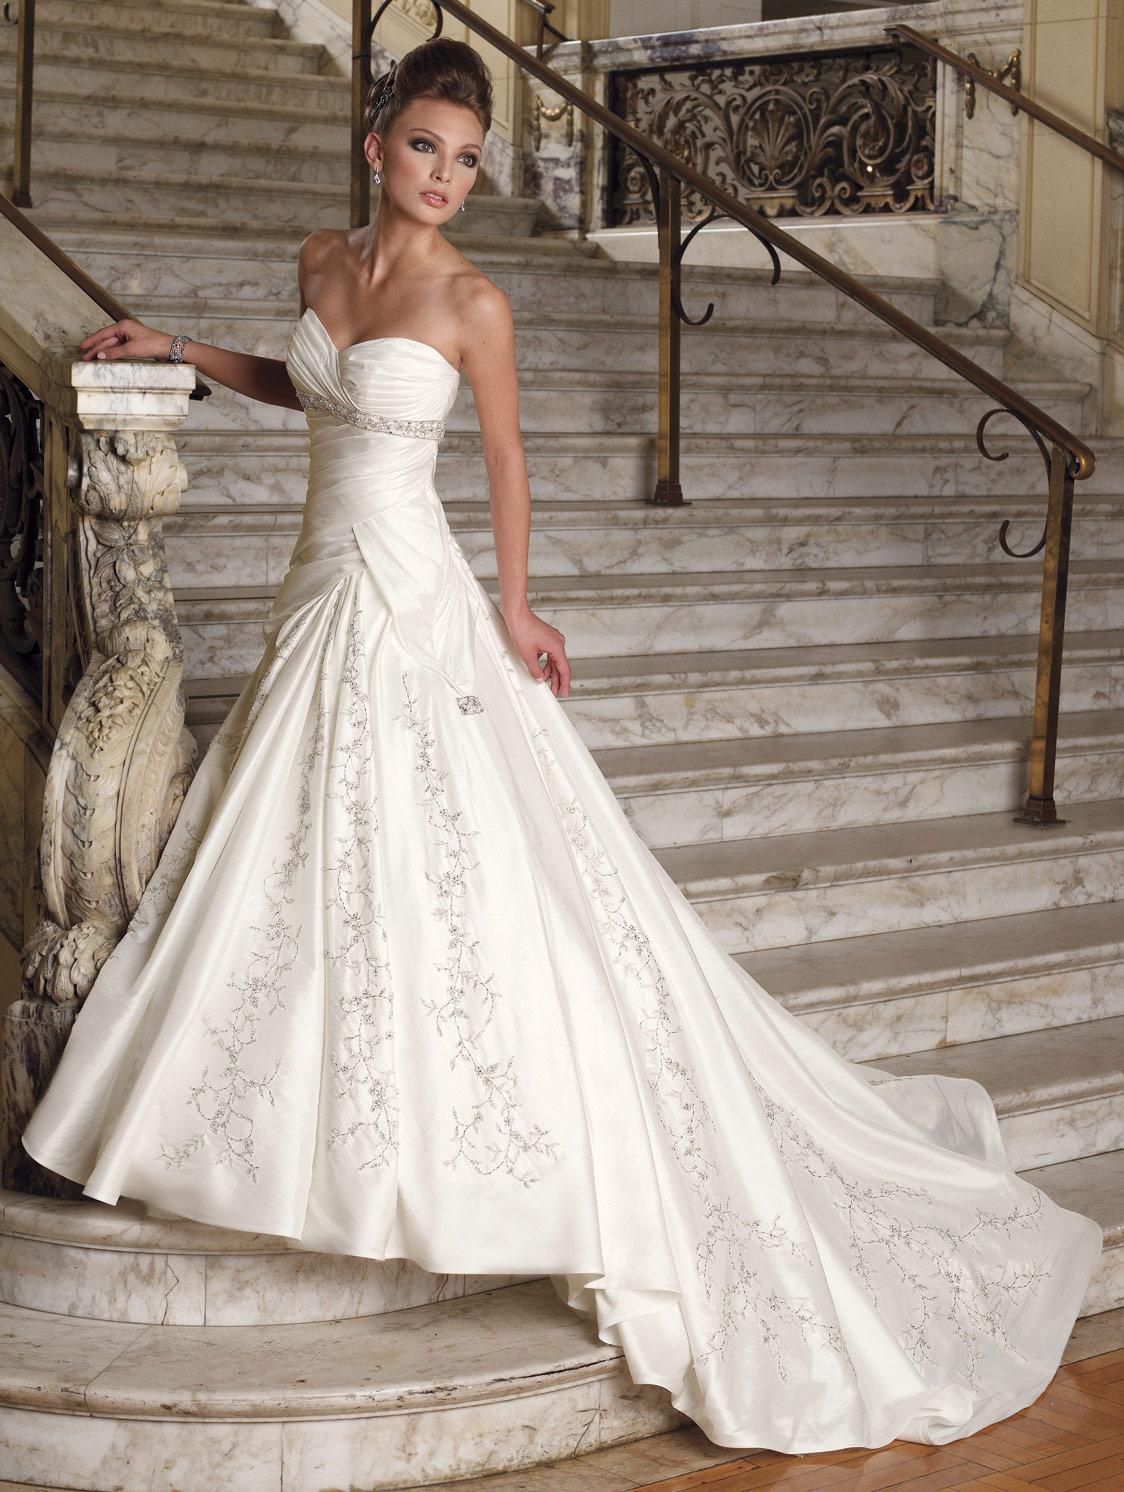 Designer wedding dress mermaid style long white designer wedding dress